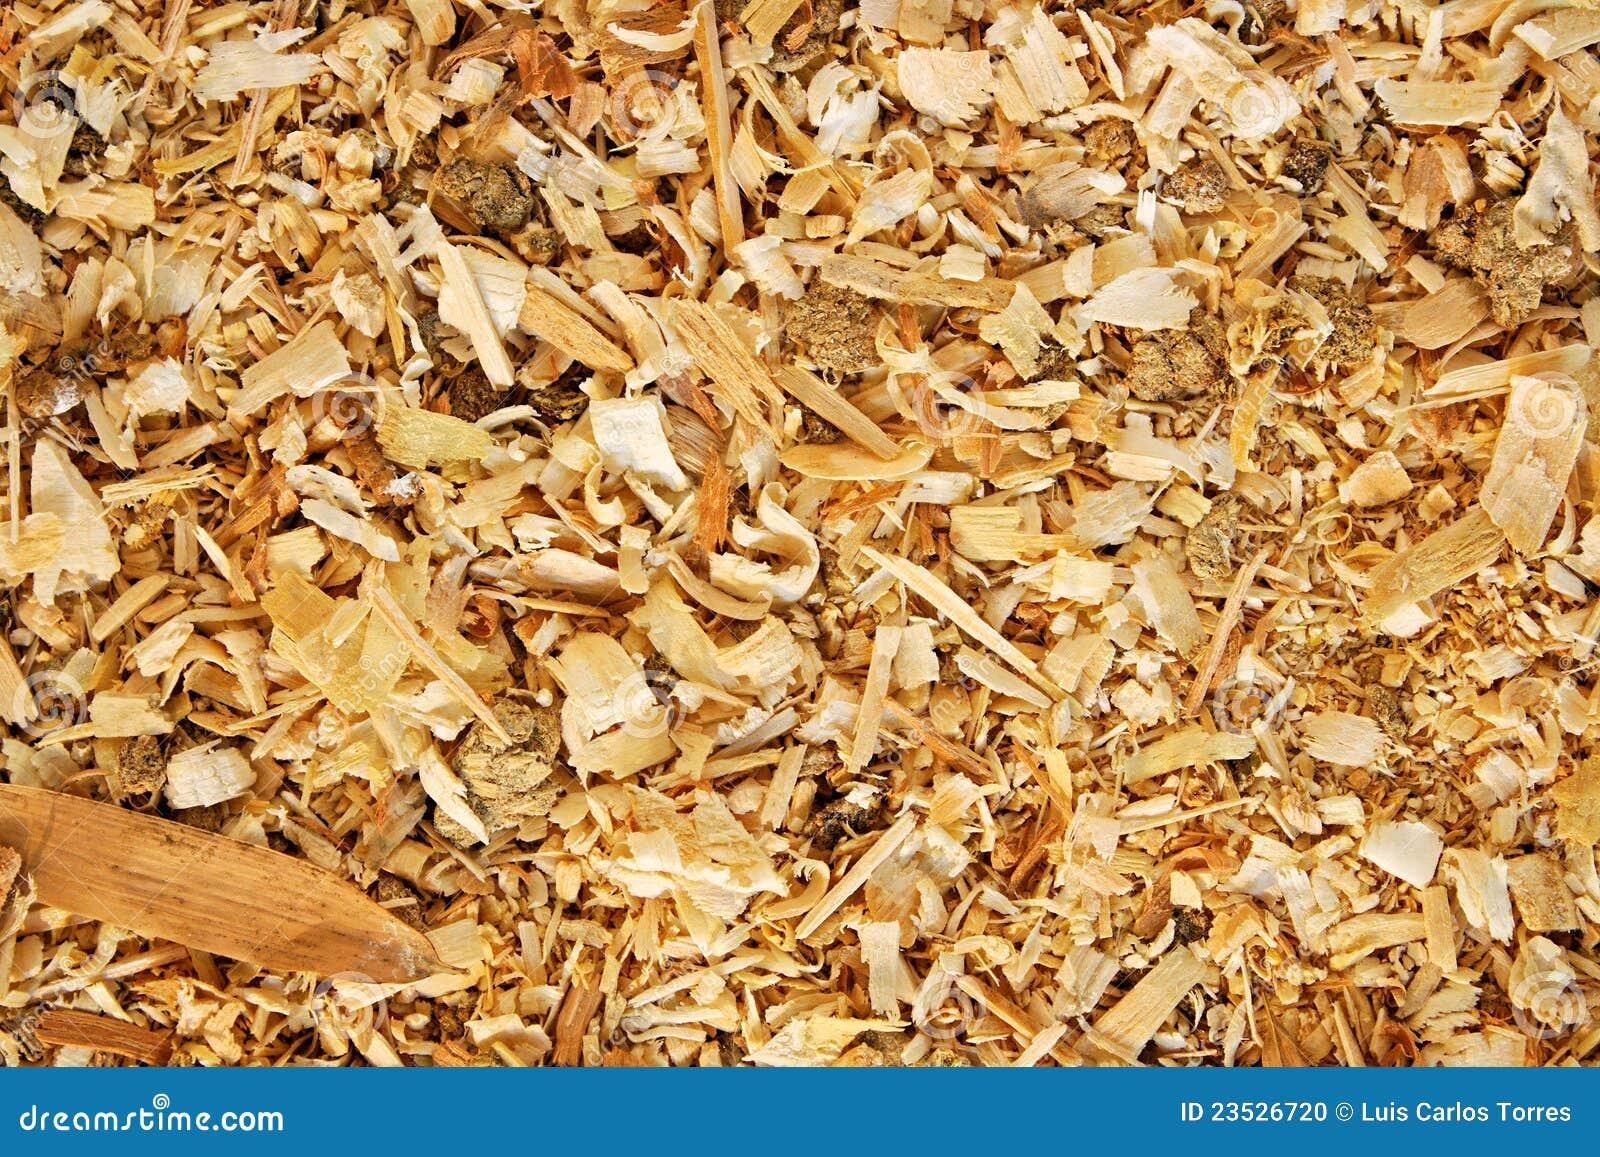 Sawdust animal bedding